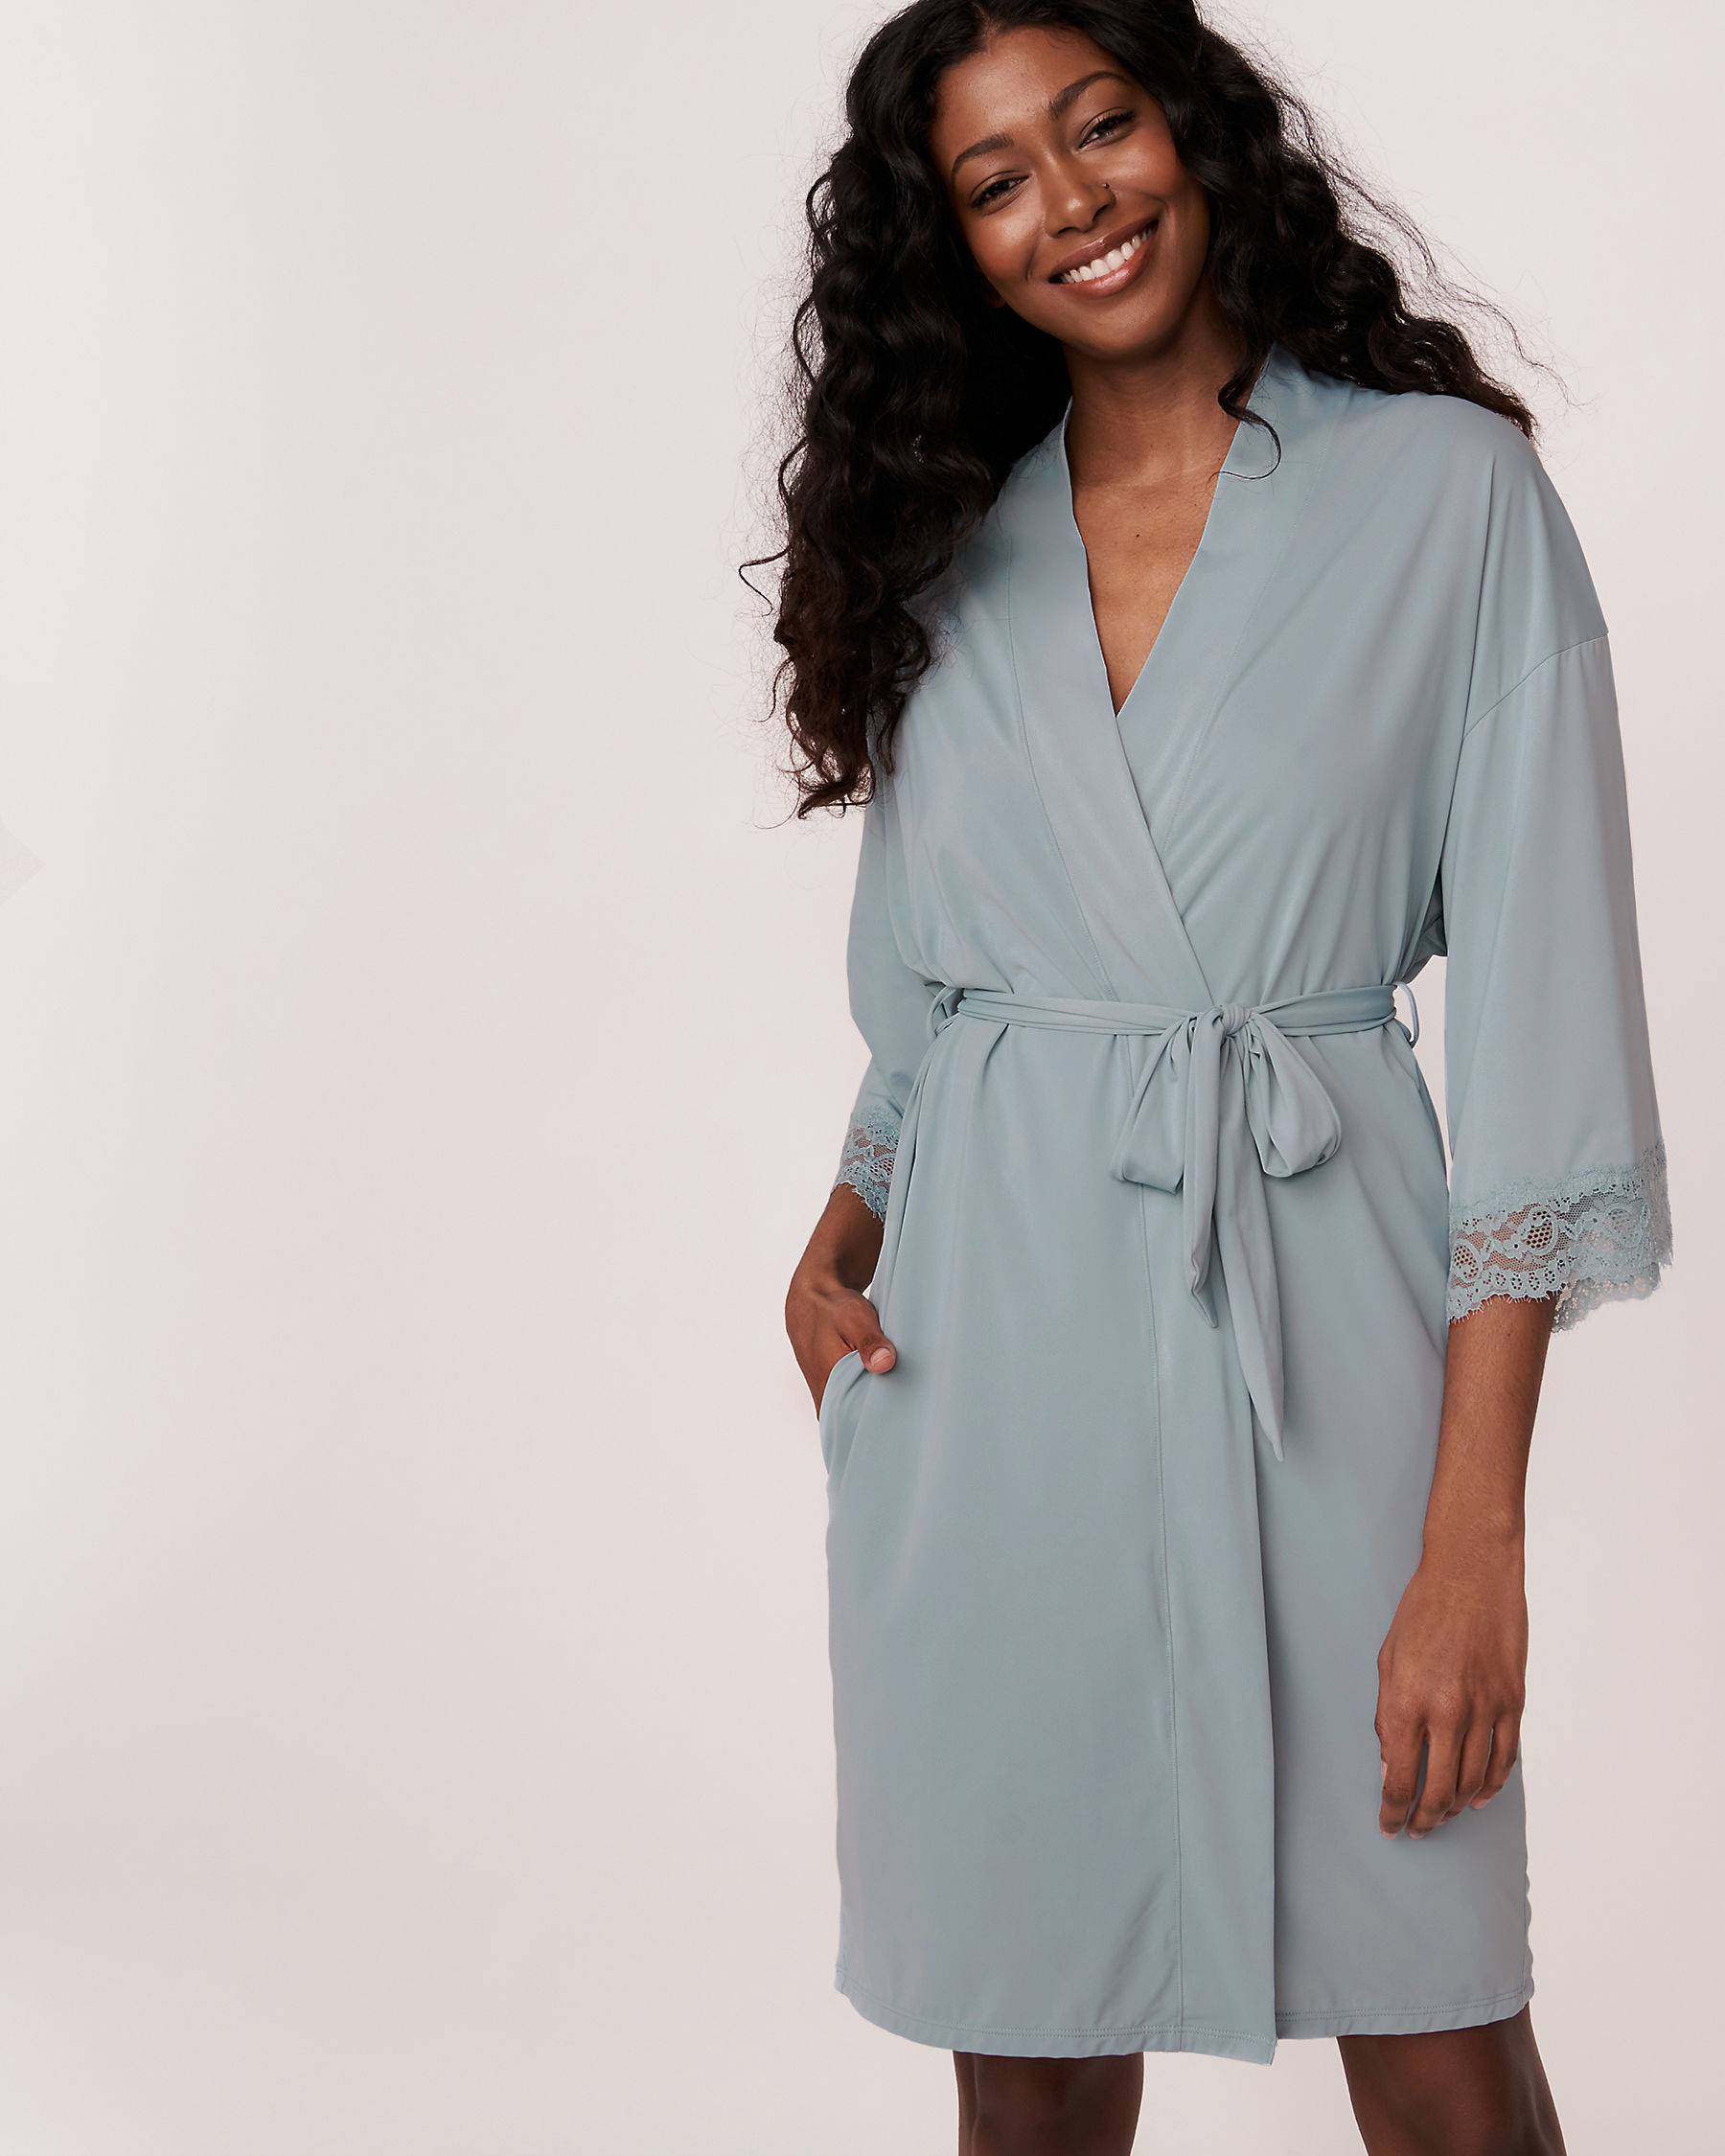 LA VIE EN ROSE Kimono garniture de dentelle Bleu gris 60600001 - Voir3